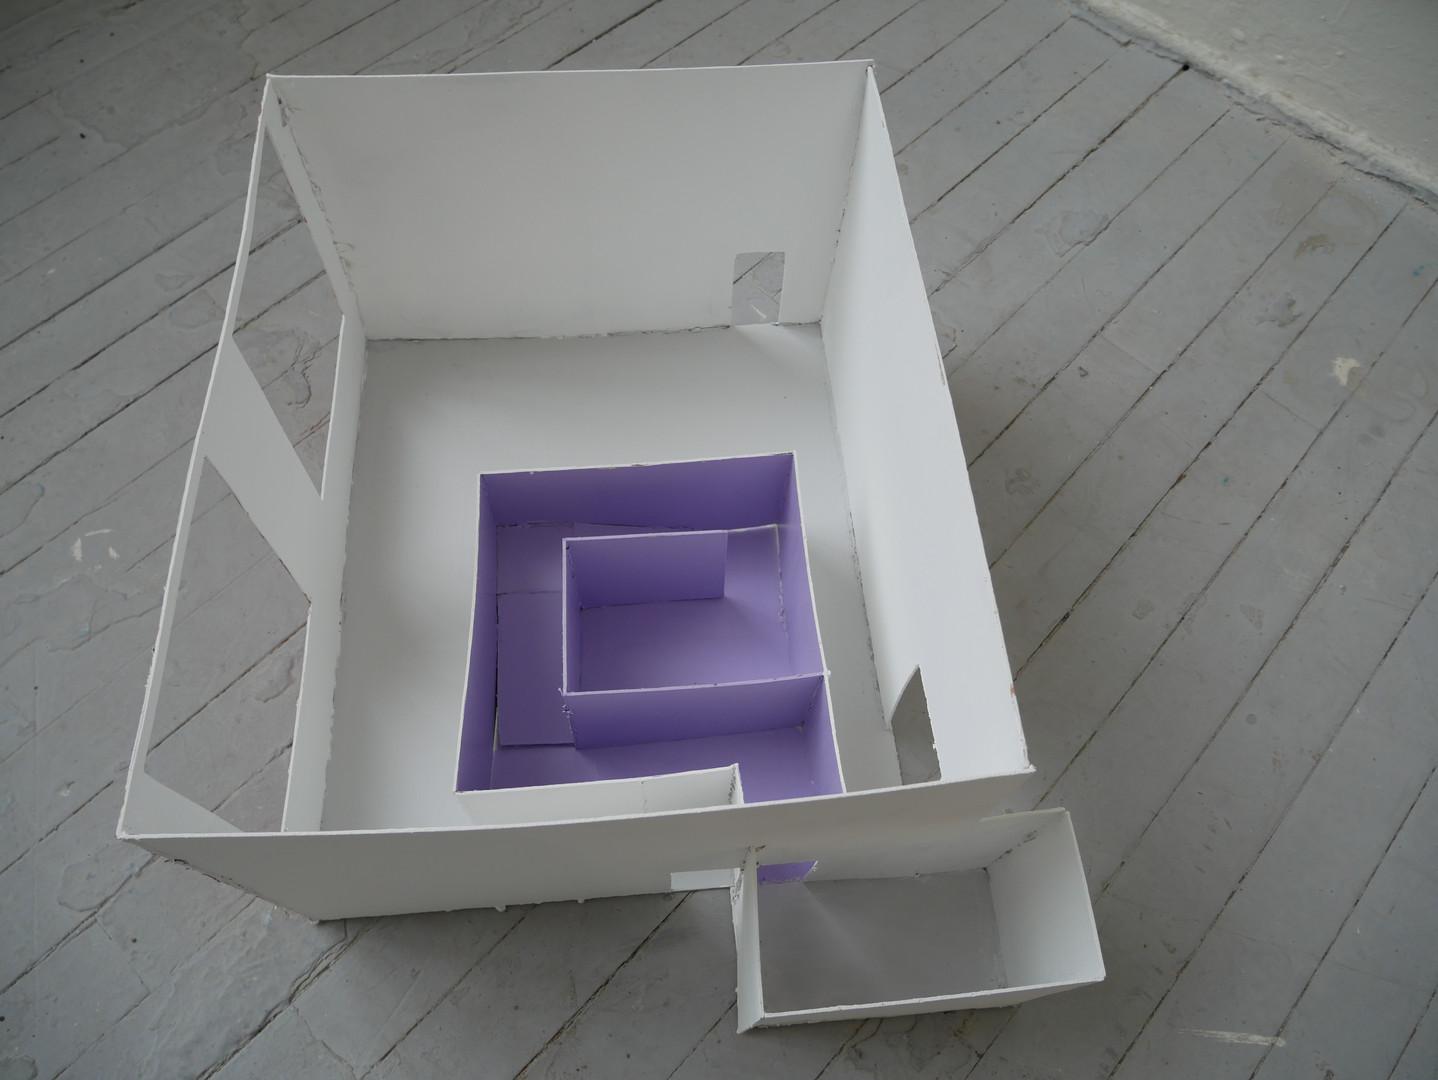 Safe Haven Interior / Exterior, 2019. Edinburgh College of Art.